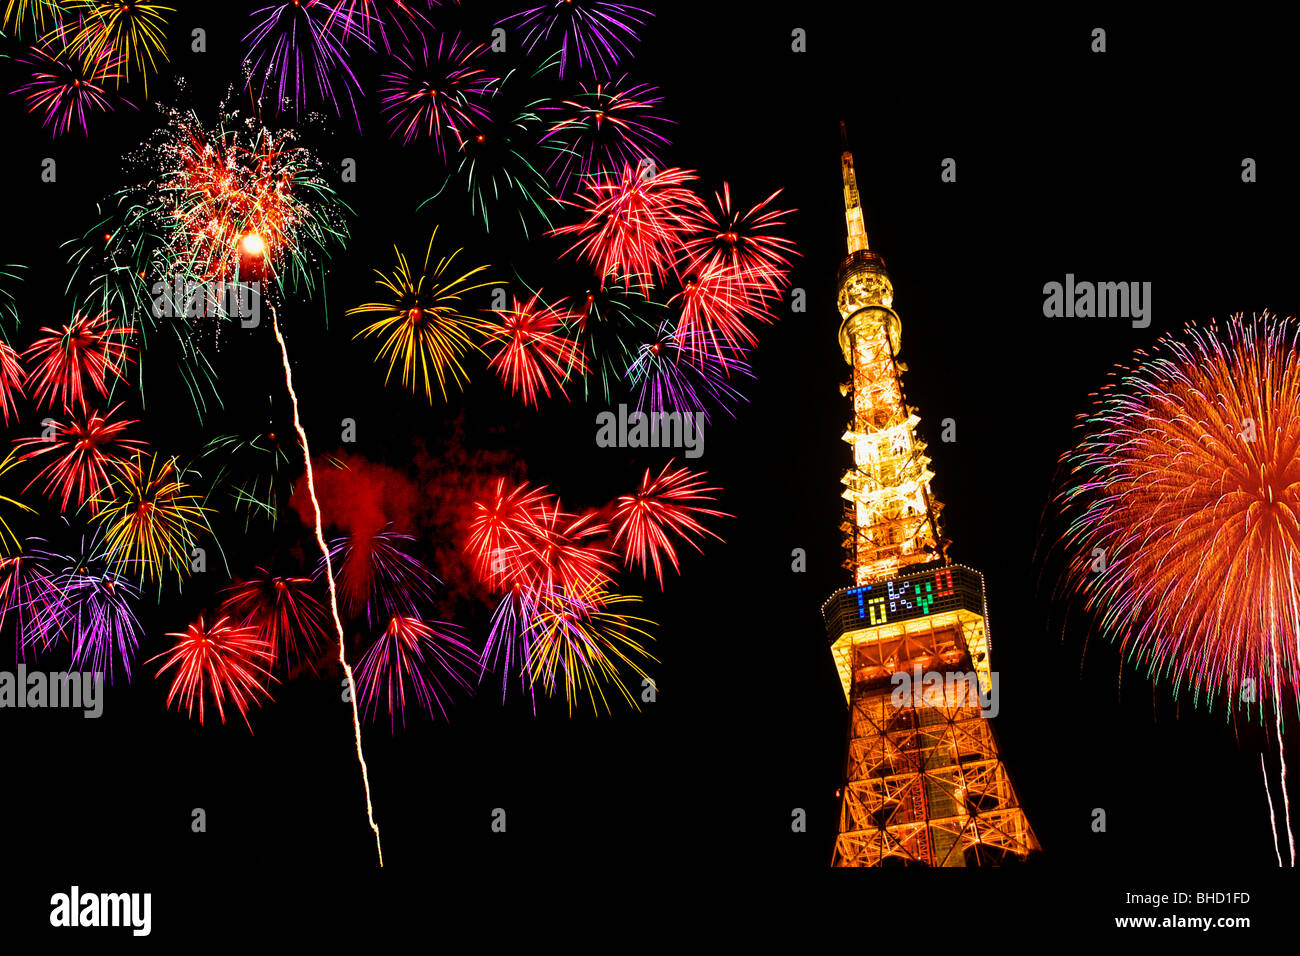 Fireworks display above Tokyo Tower, Minato-ku, Tokyo, Japan Stock Photo